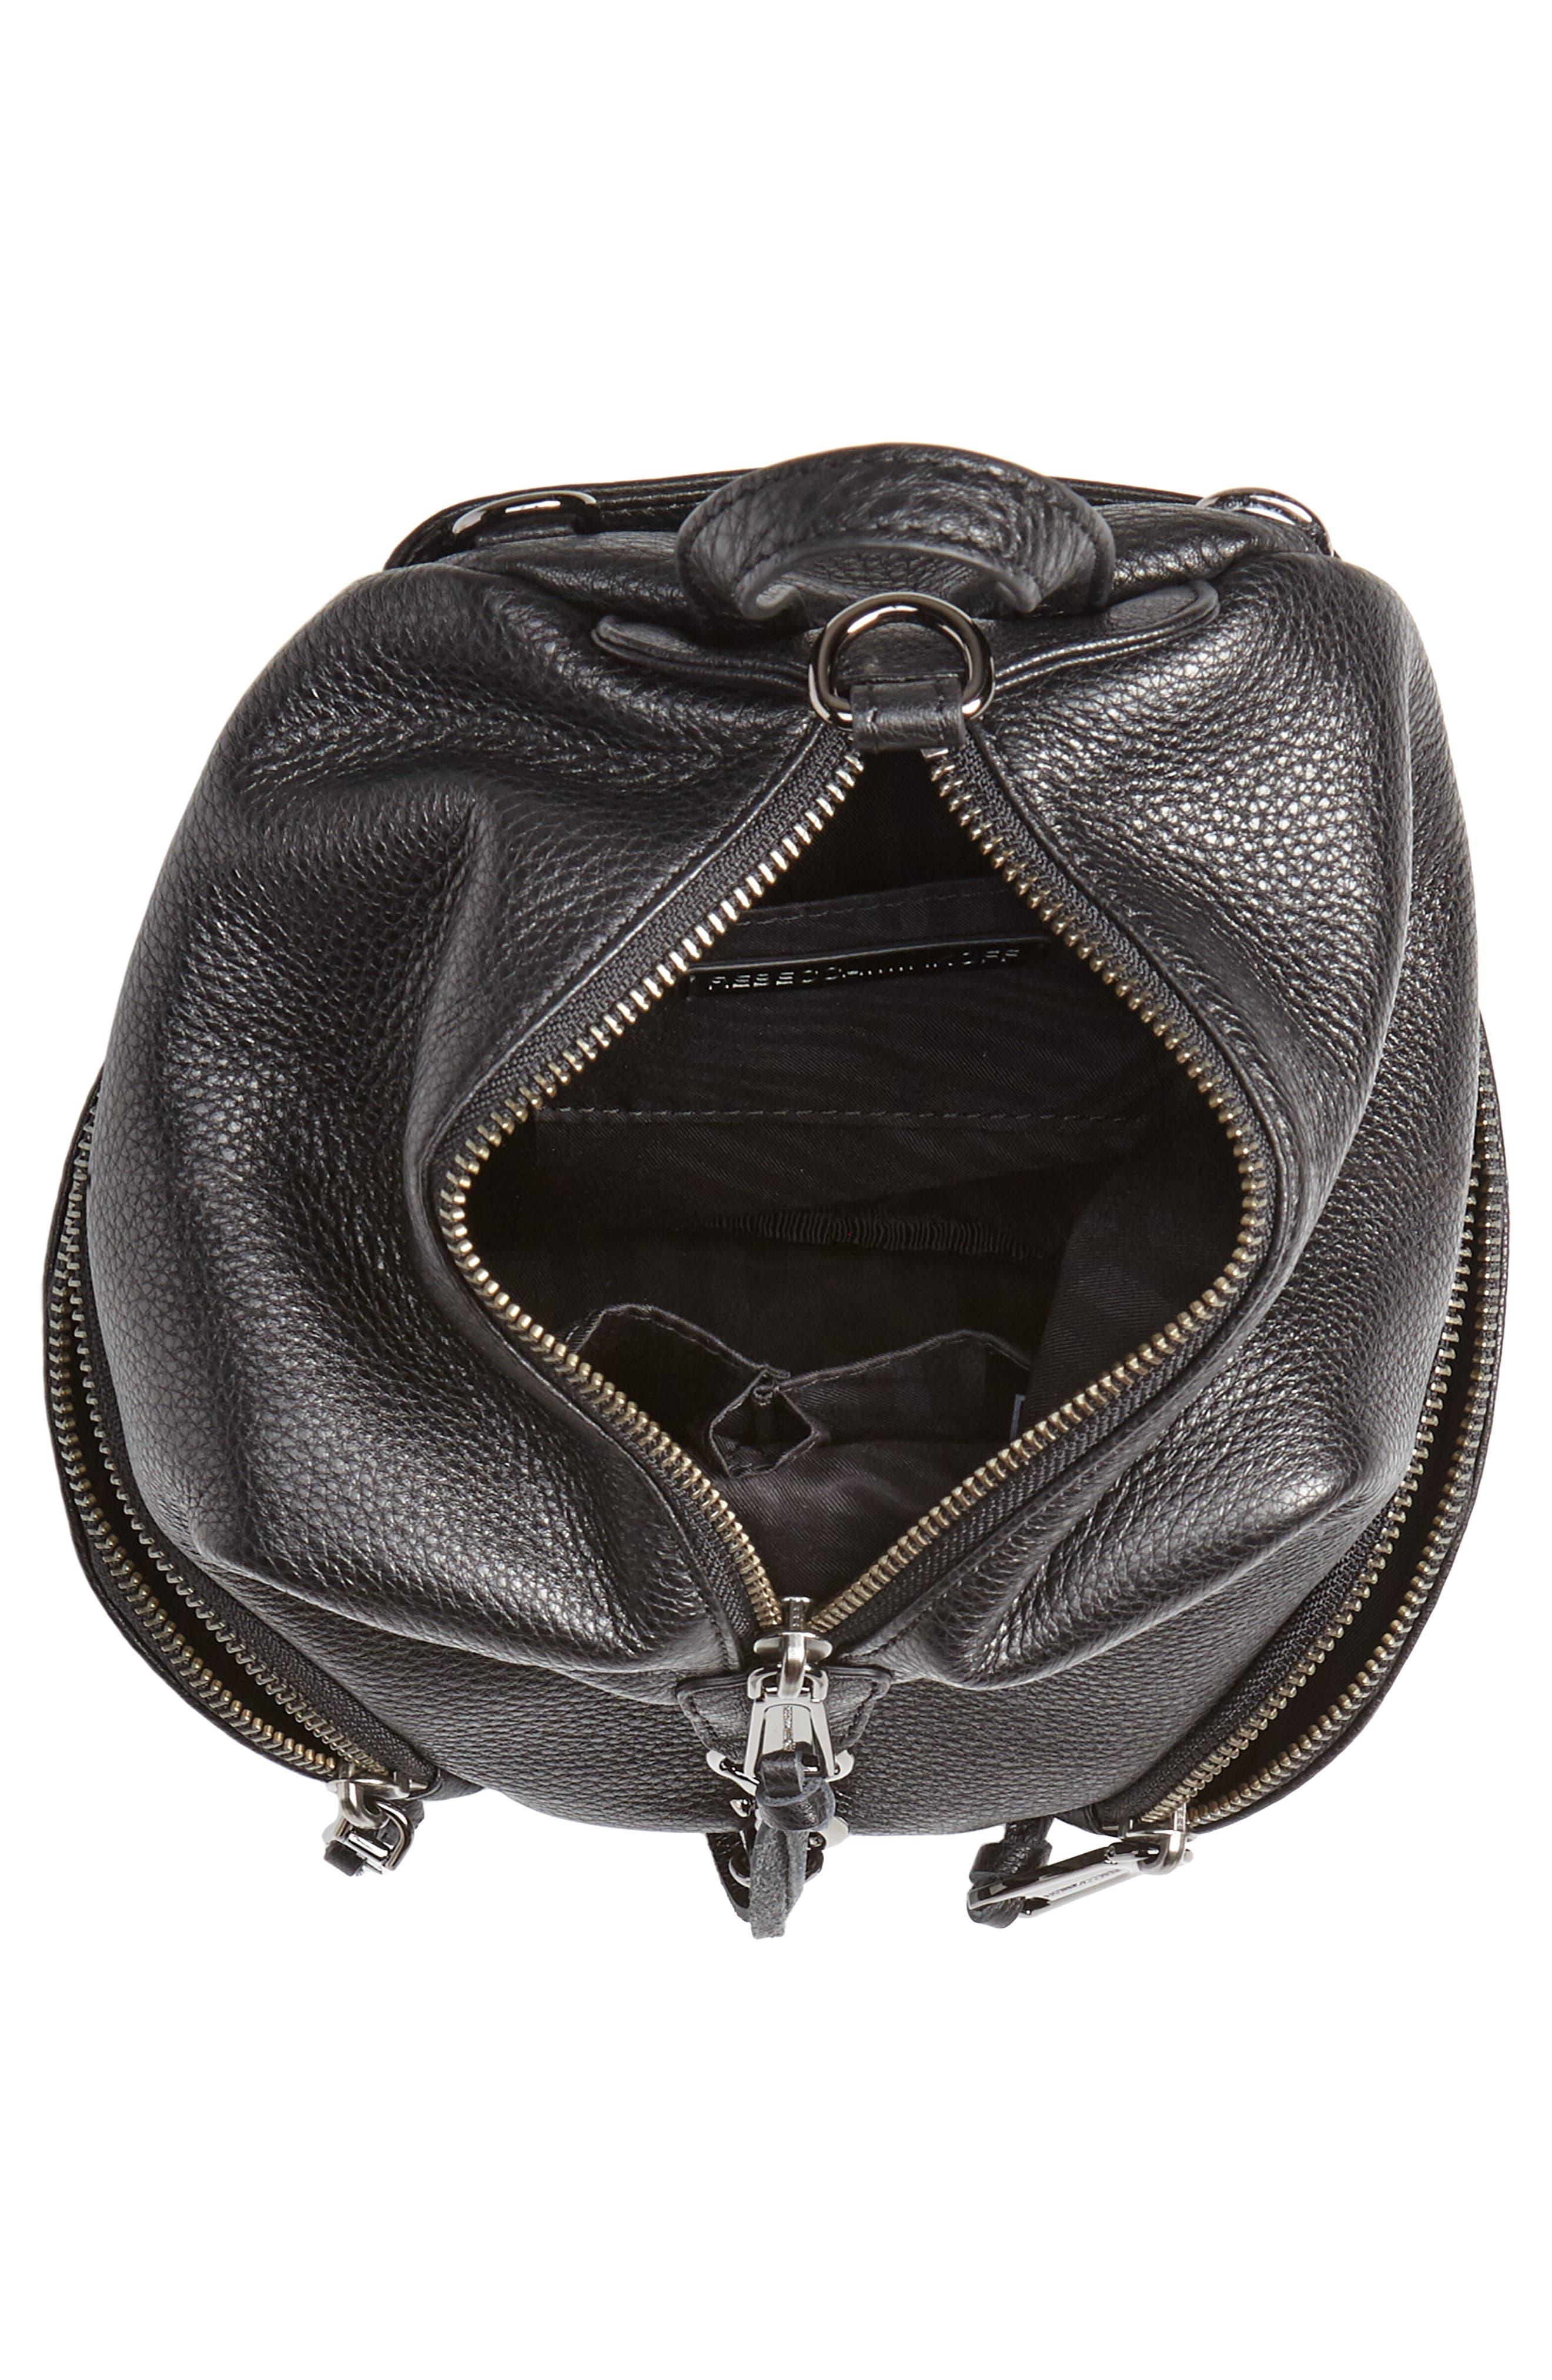 REBECCA MINKOFF, Mini Julian Pebbled Leather Convertible Backpack, Alternate thumbnail 6, color, BLACK